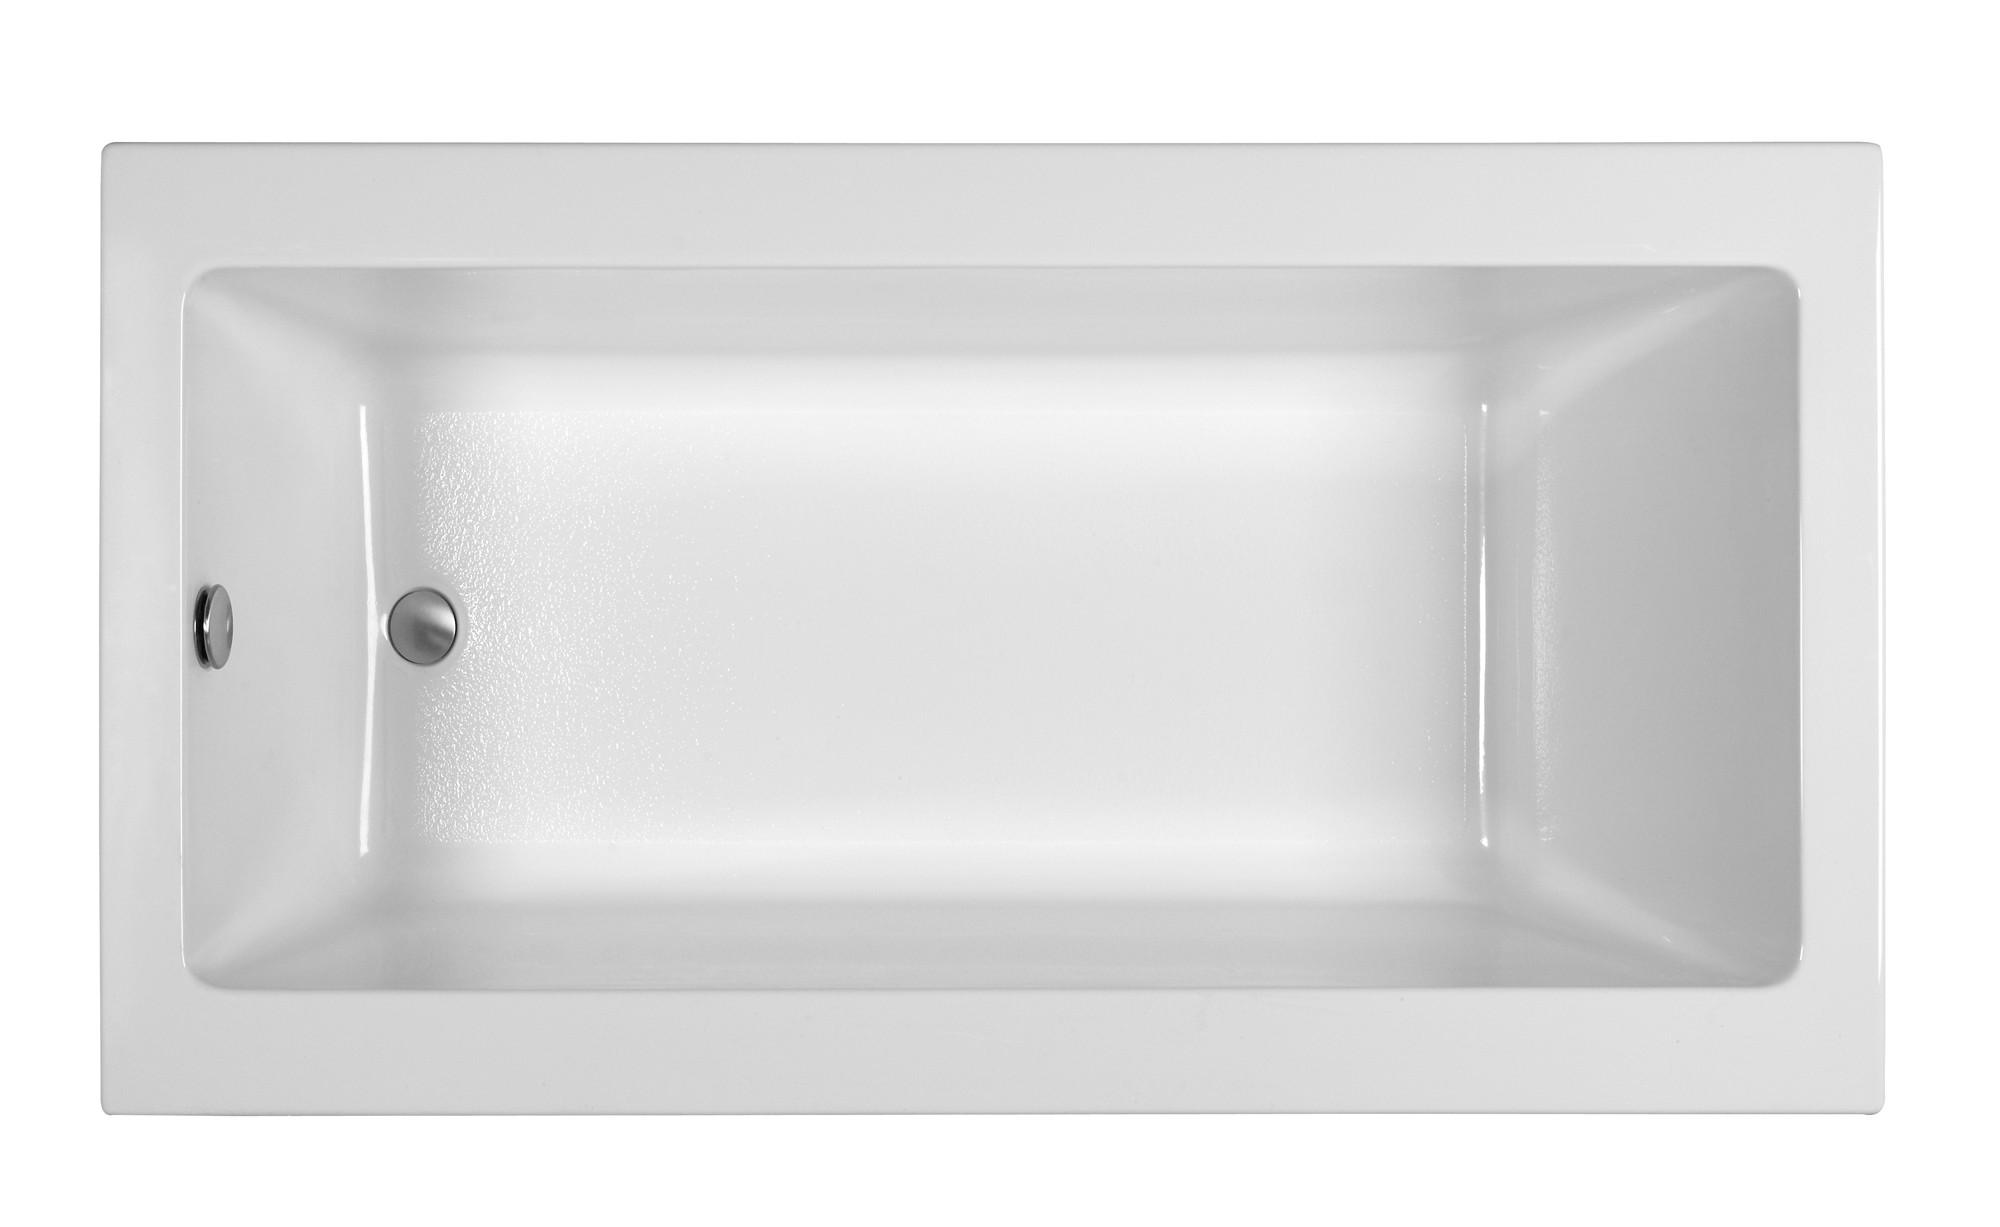 Reliance R6632CRFSX End Drain Freestanding Soaking Tub